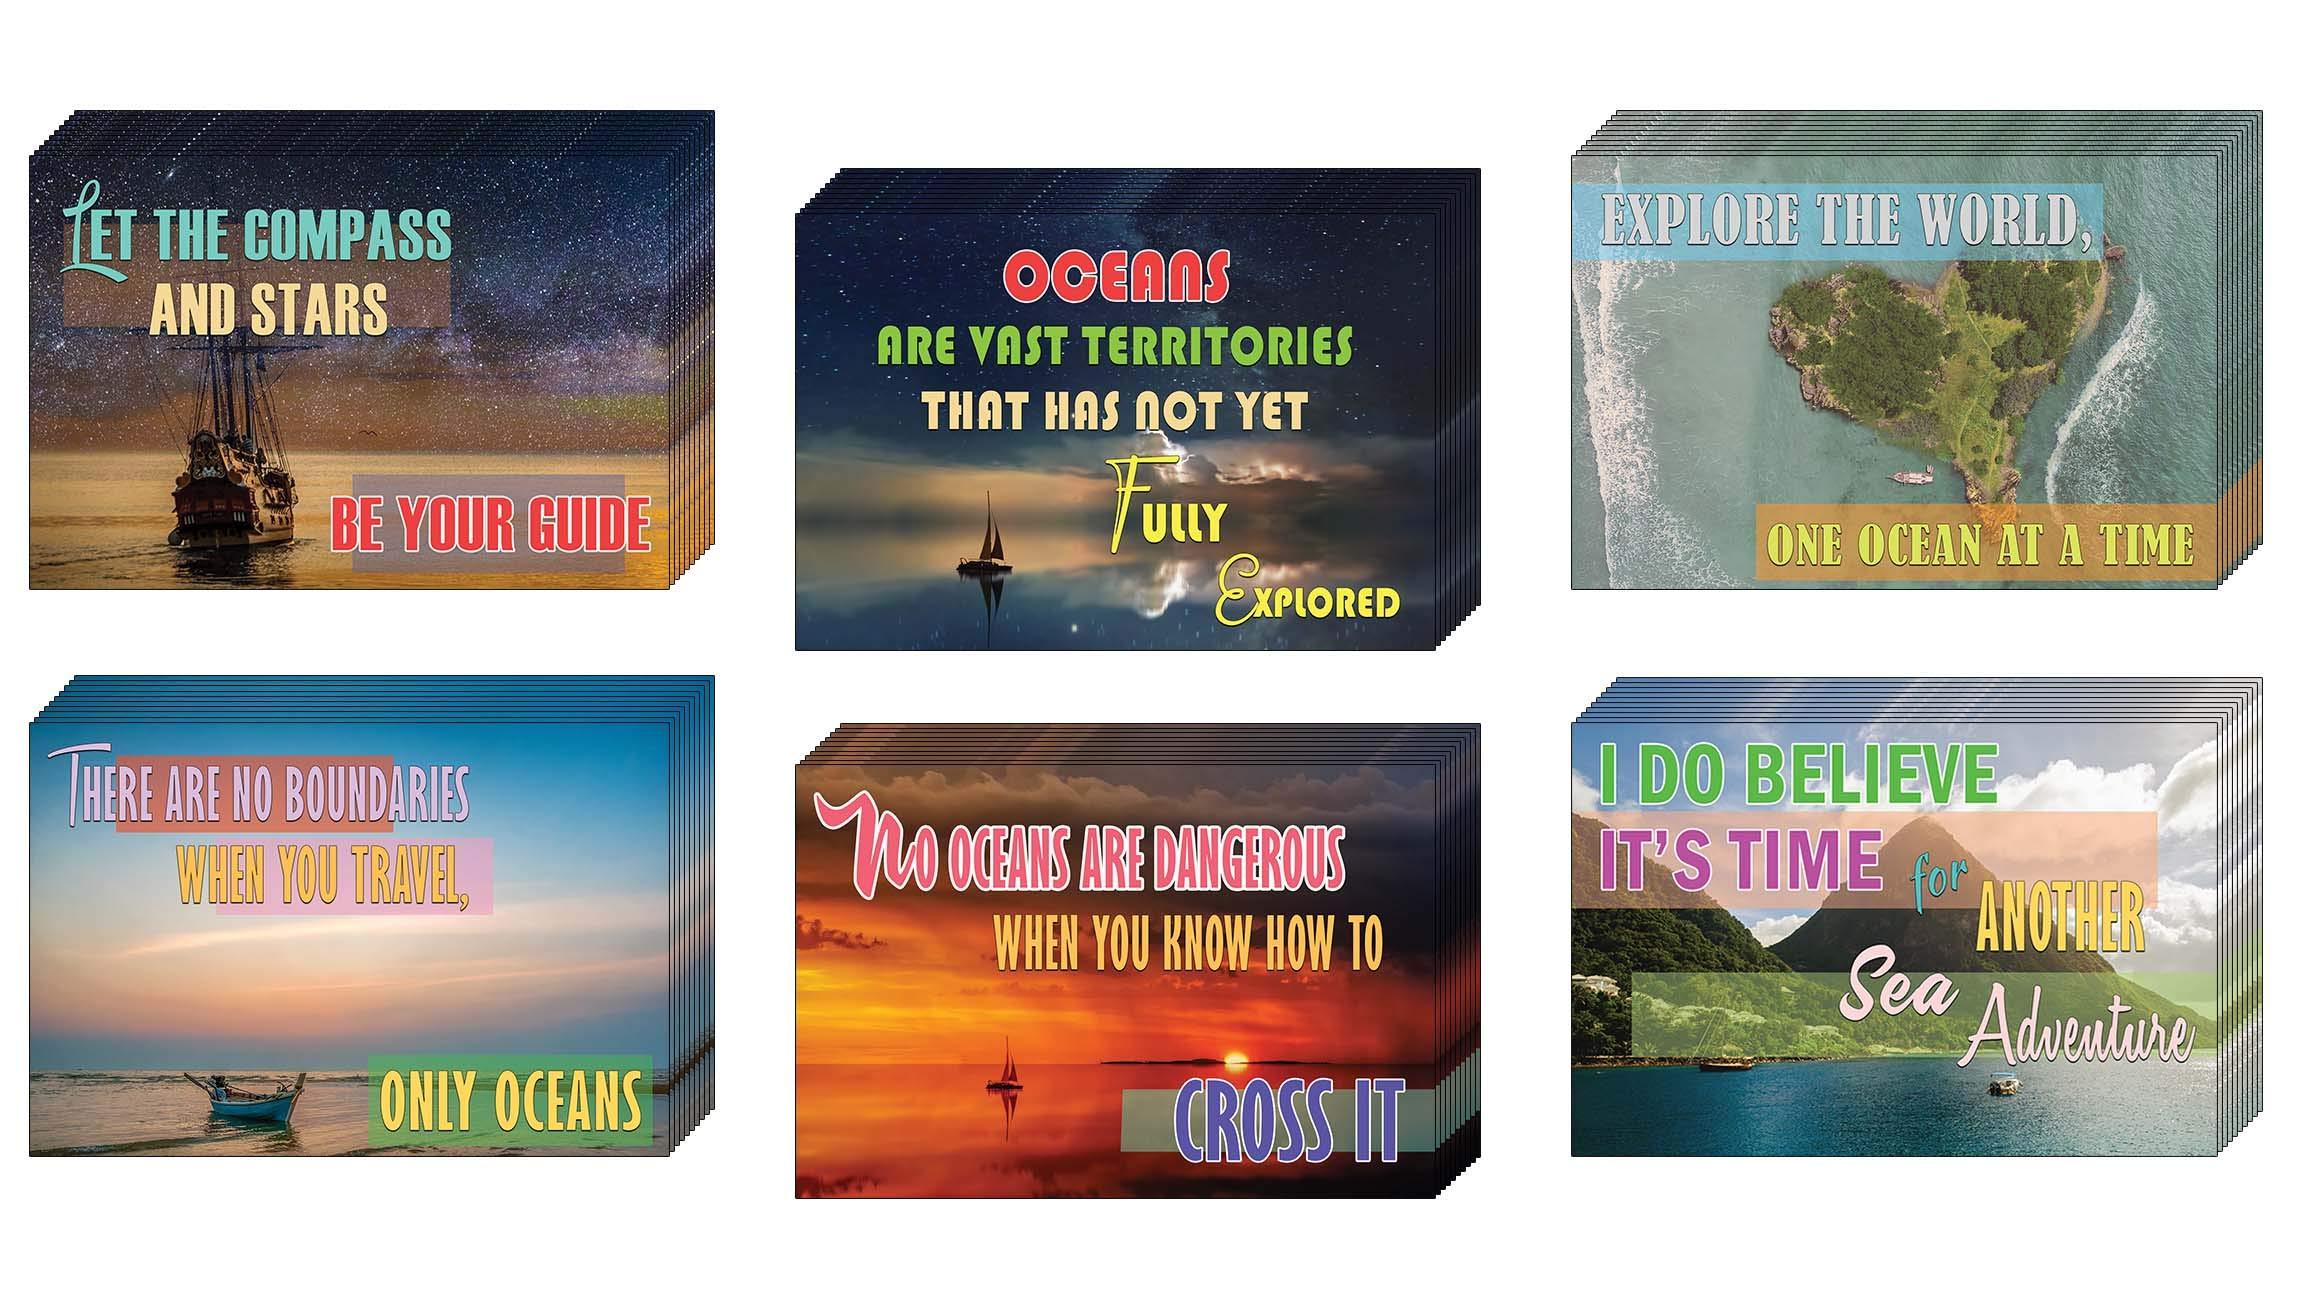 Creanoso Sea Travel Inspirational Sayings Postcards (60-Pack) – Sea Adventures Greeting Card Giveaways for Travelers, Adventurers, Explorers, Adult Men & Women – Employee Incentive Rewards